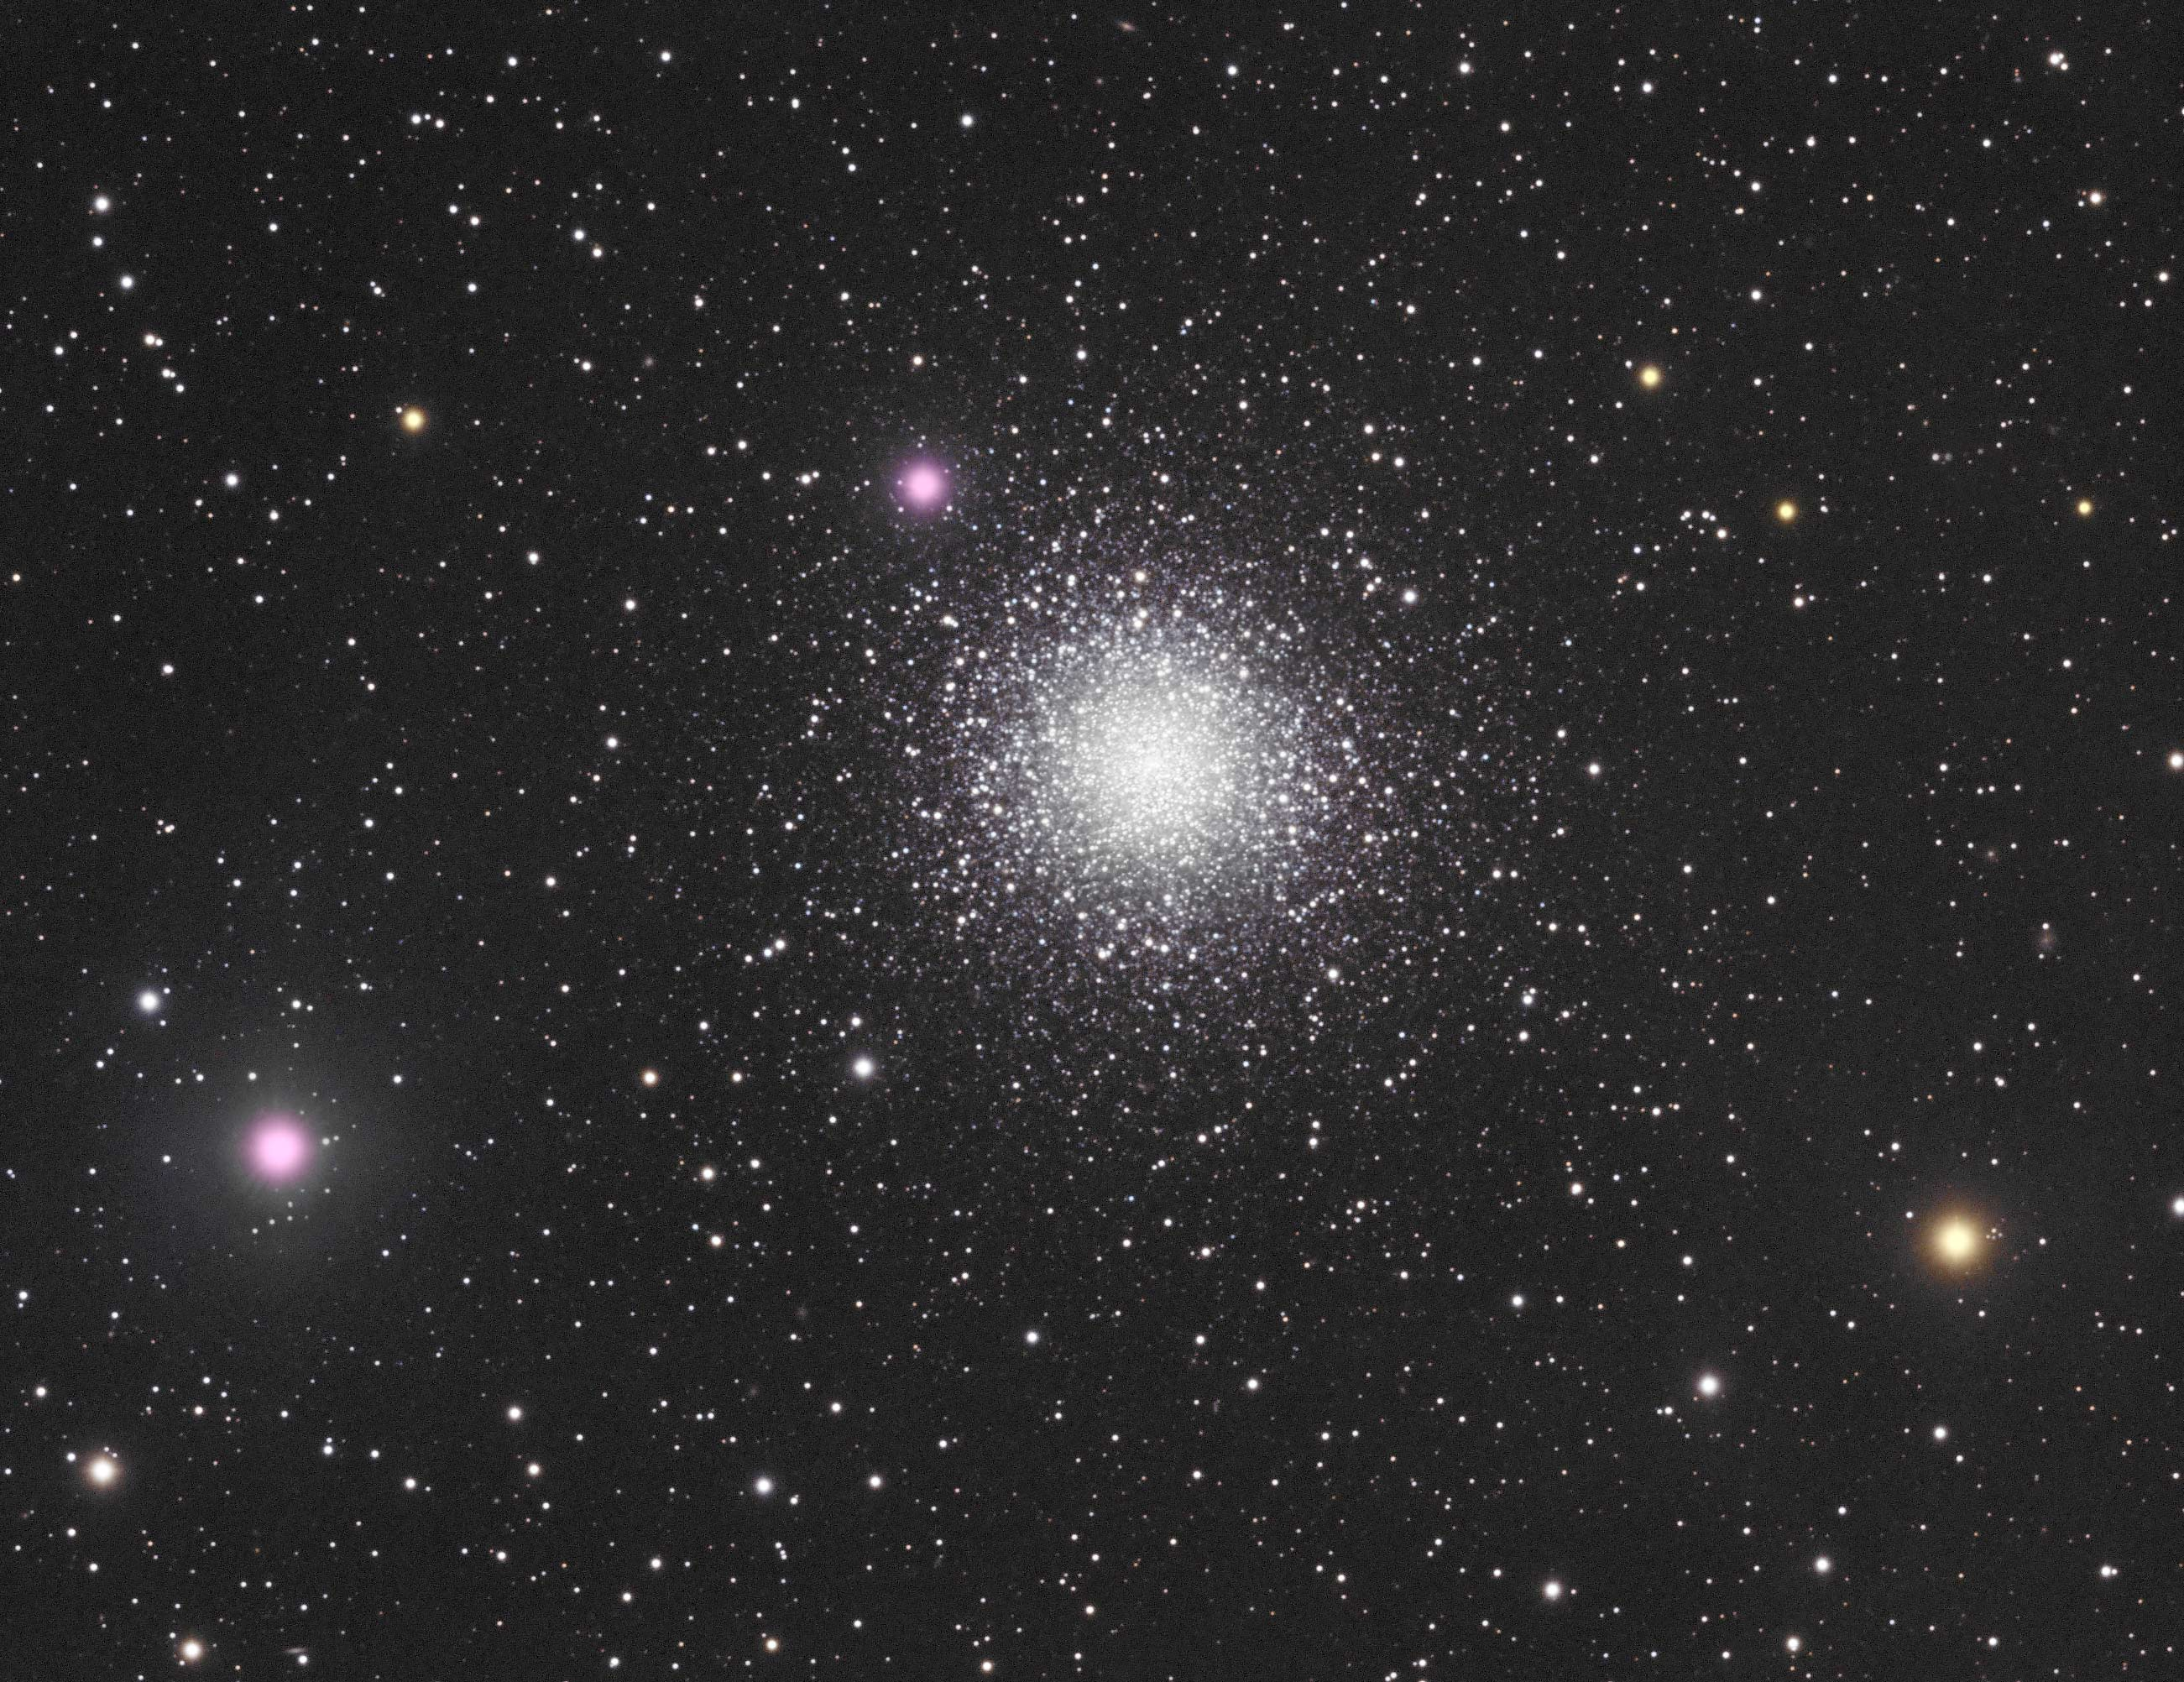 M15_Globular_Cluster.jpg